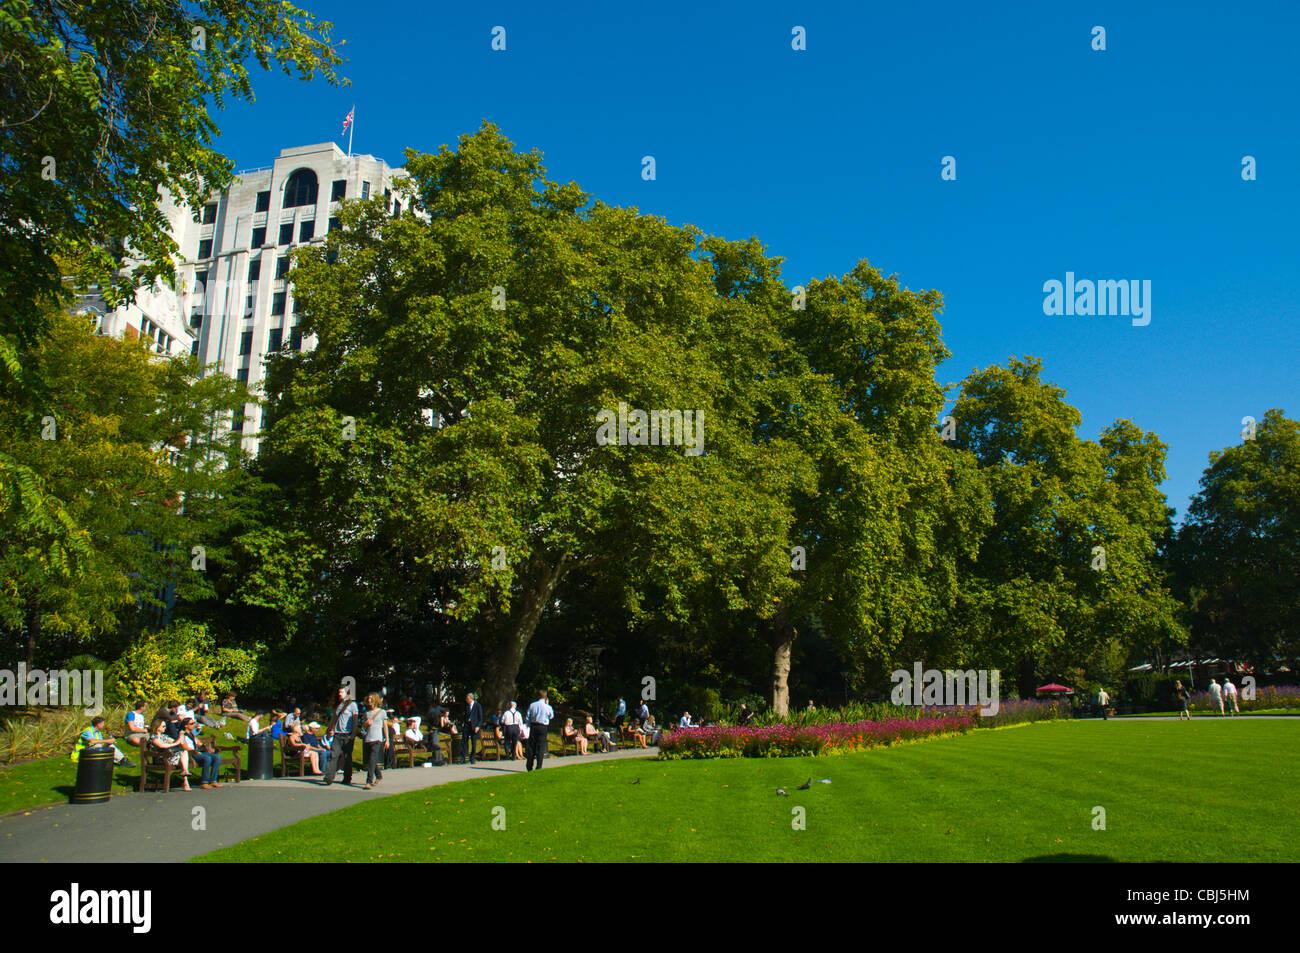 Victoria Embankment Gardens park central London England UK Europe - Stock Image